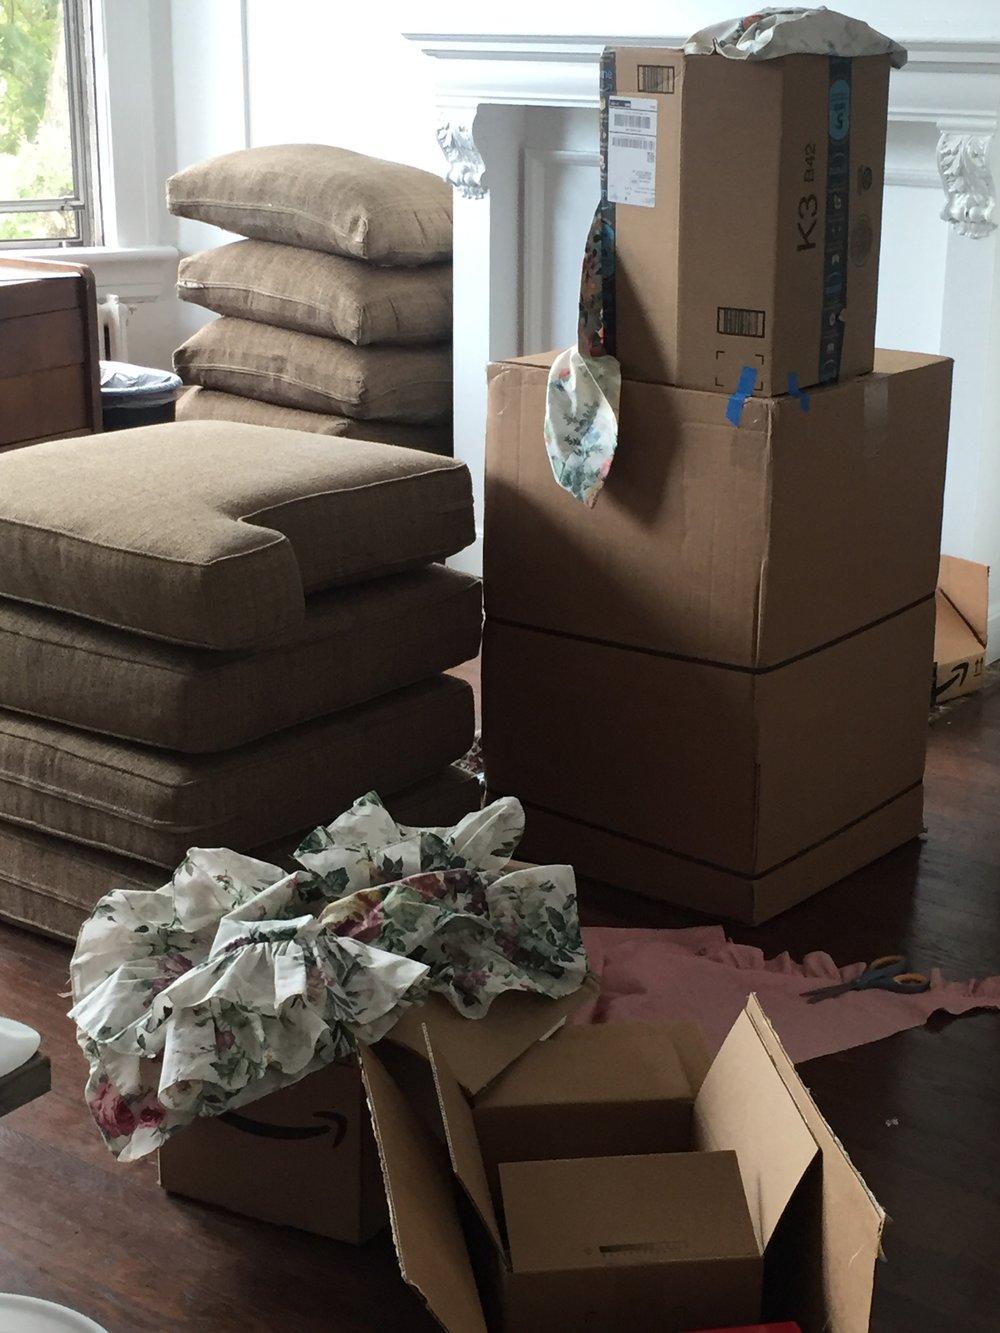 Cardboard, cushions, fabric